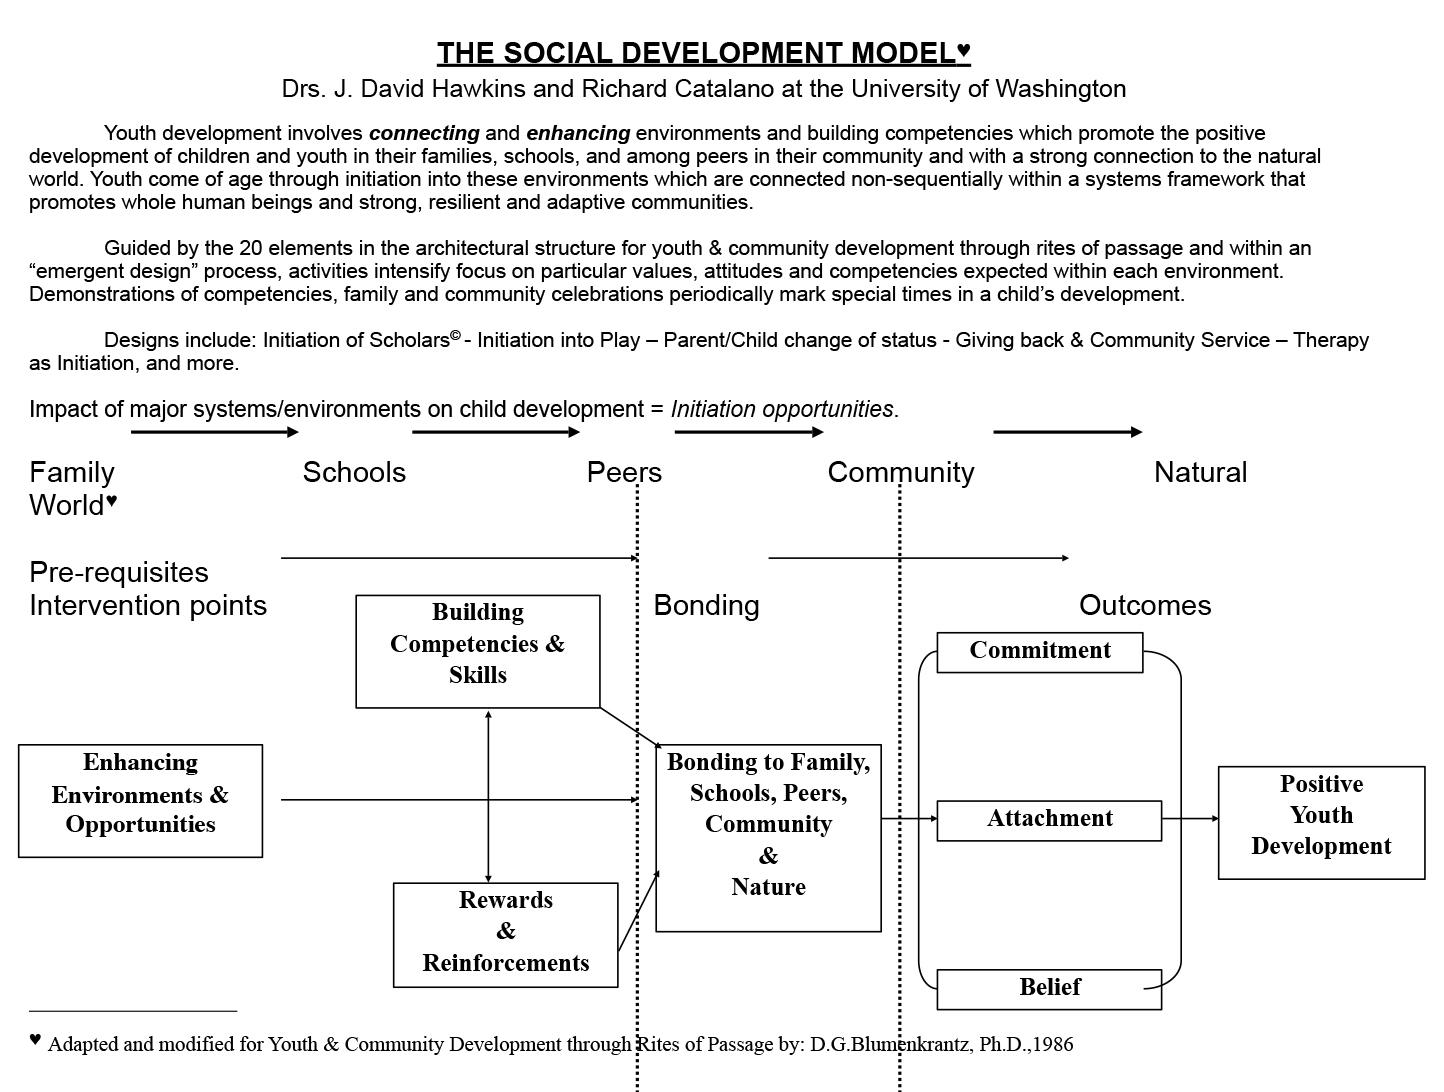 socialdevelopmentmodel